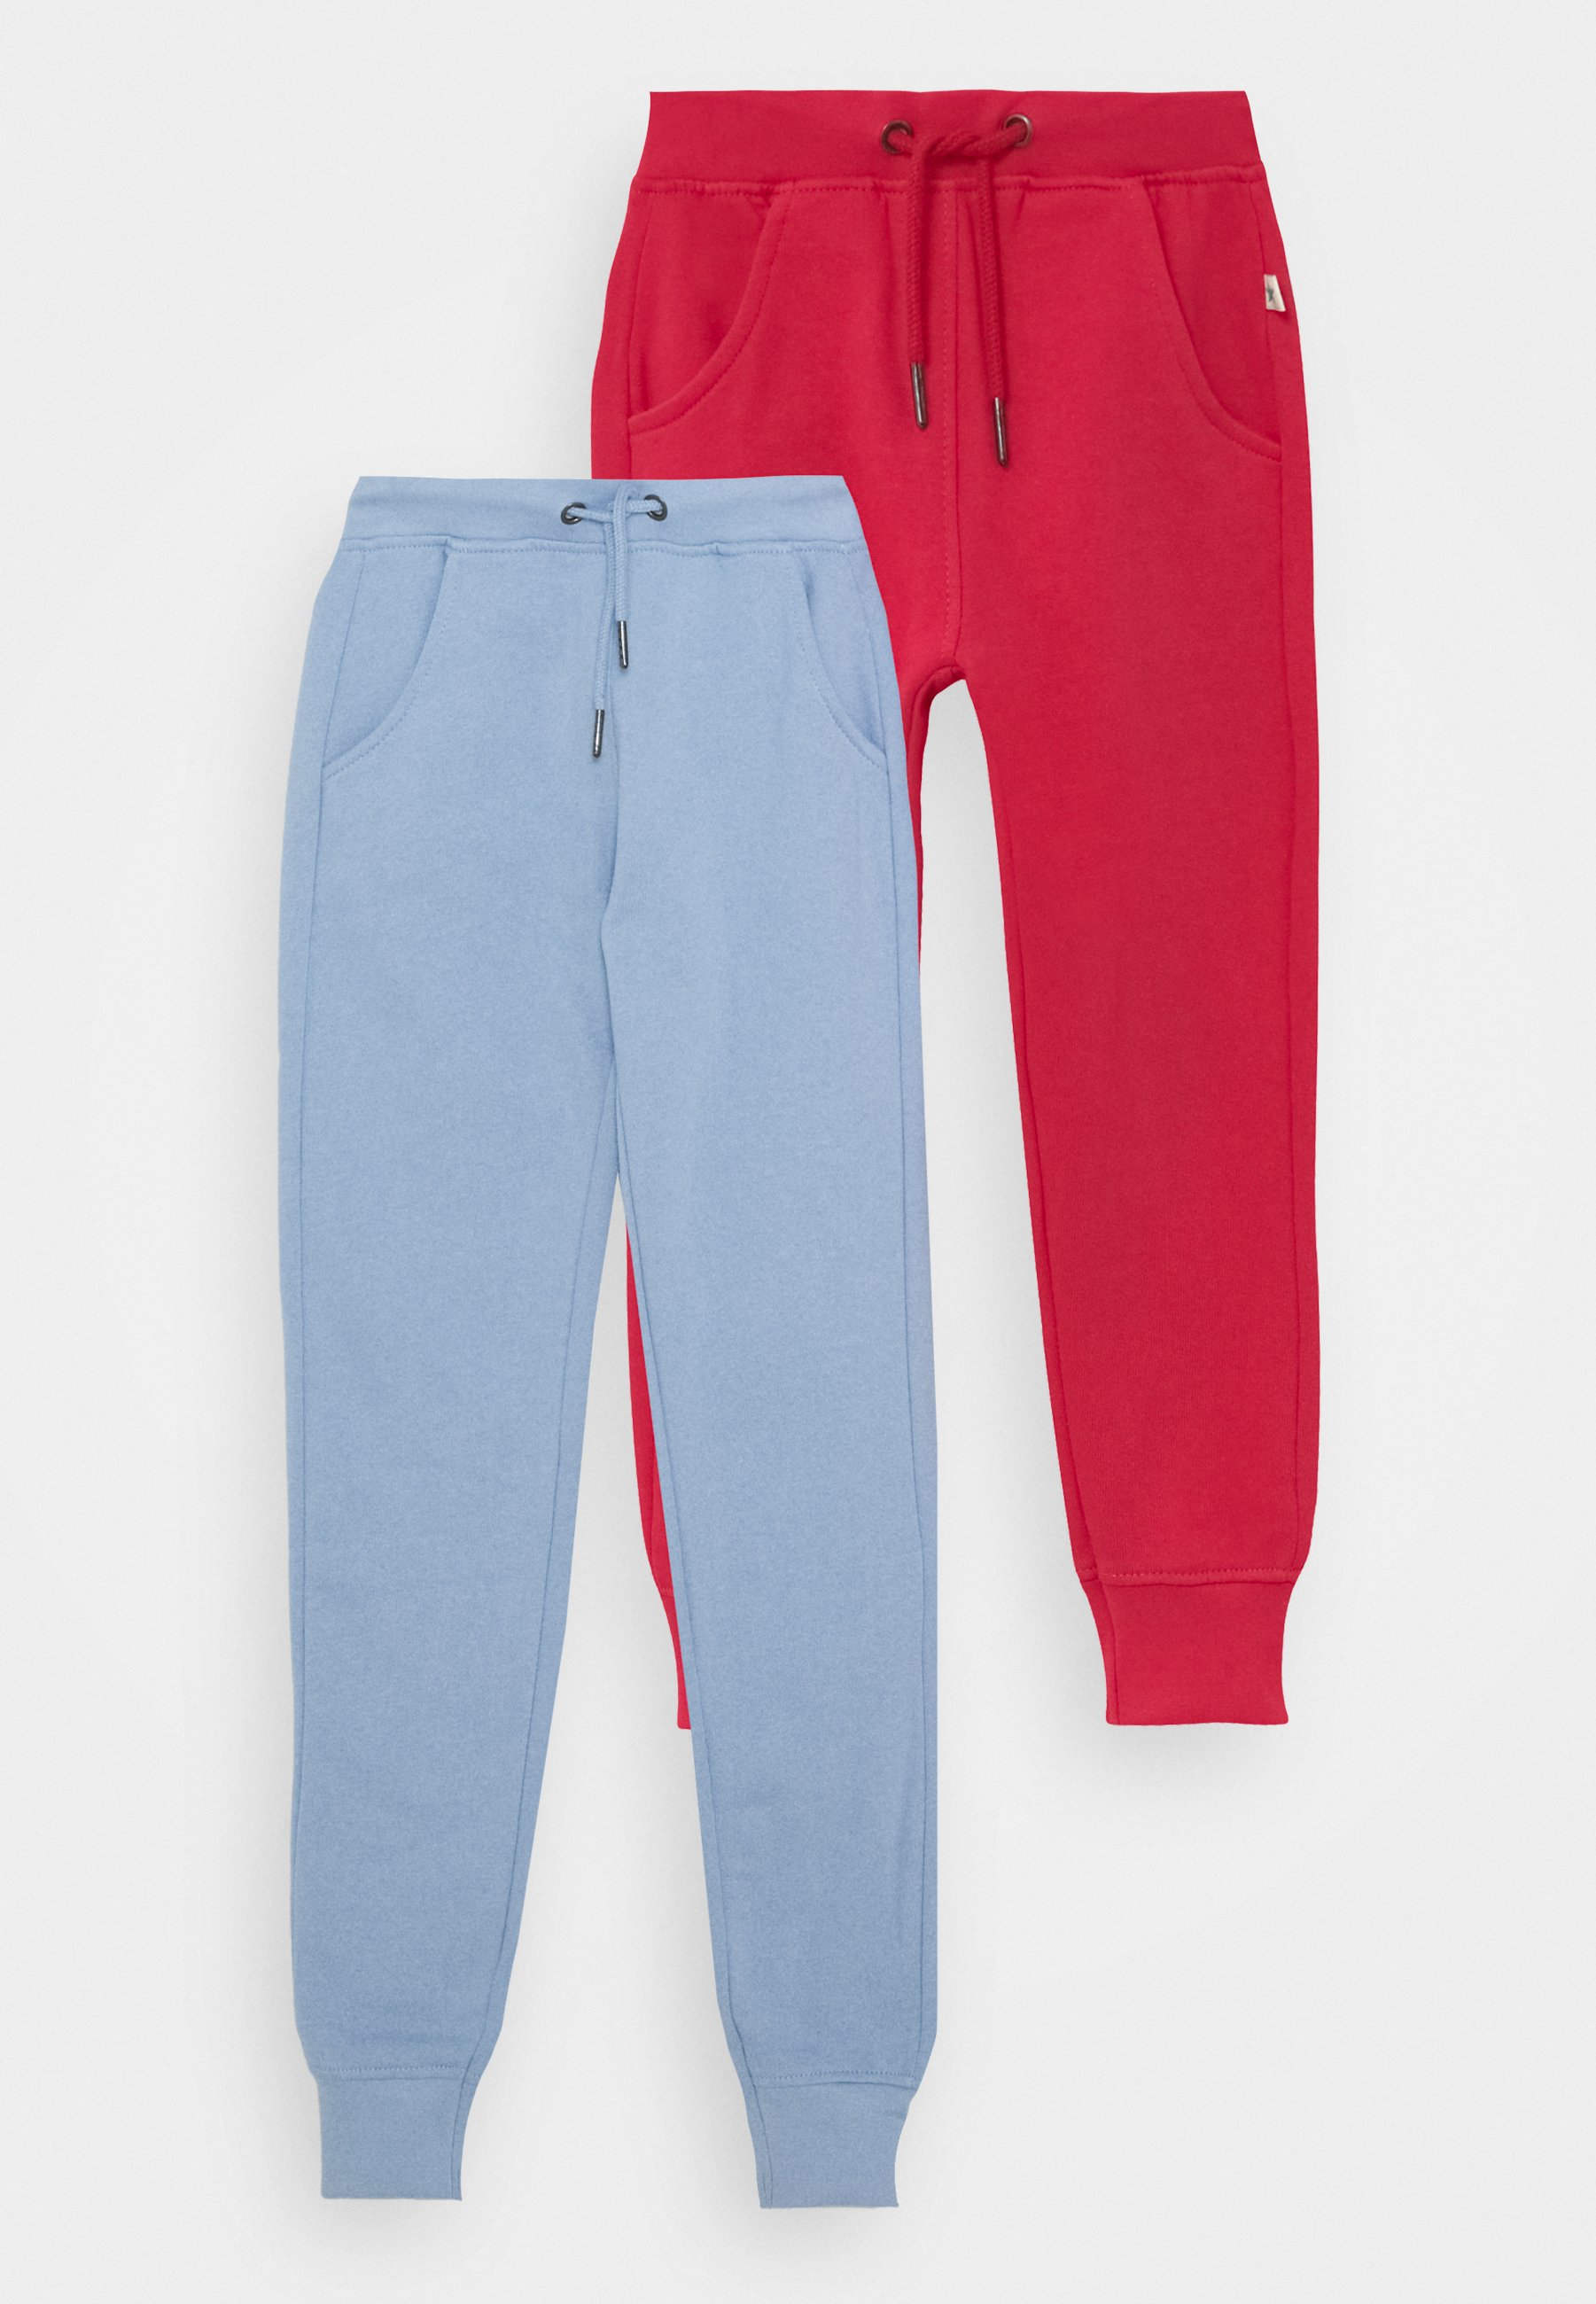 KIDS BASIC 2 PACK - Pantalones deportivos - hochrot/nachtblau